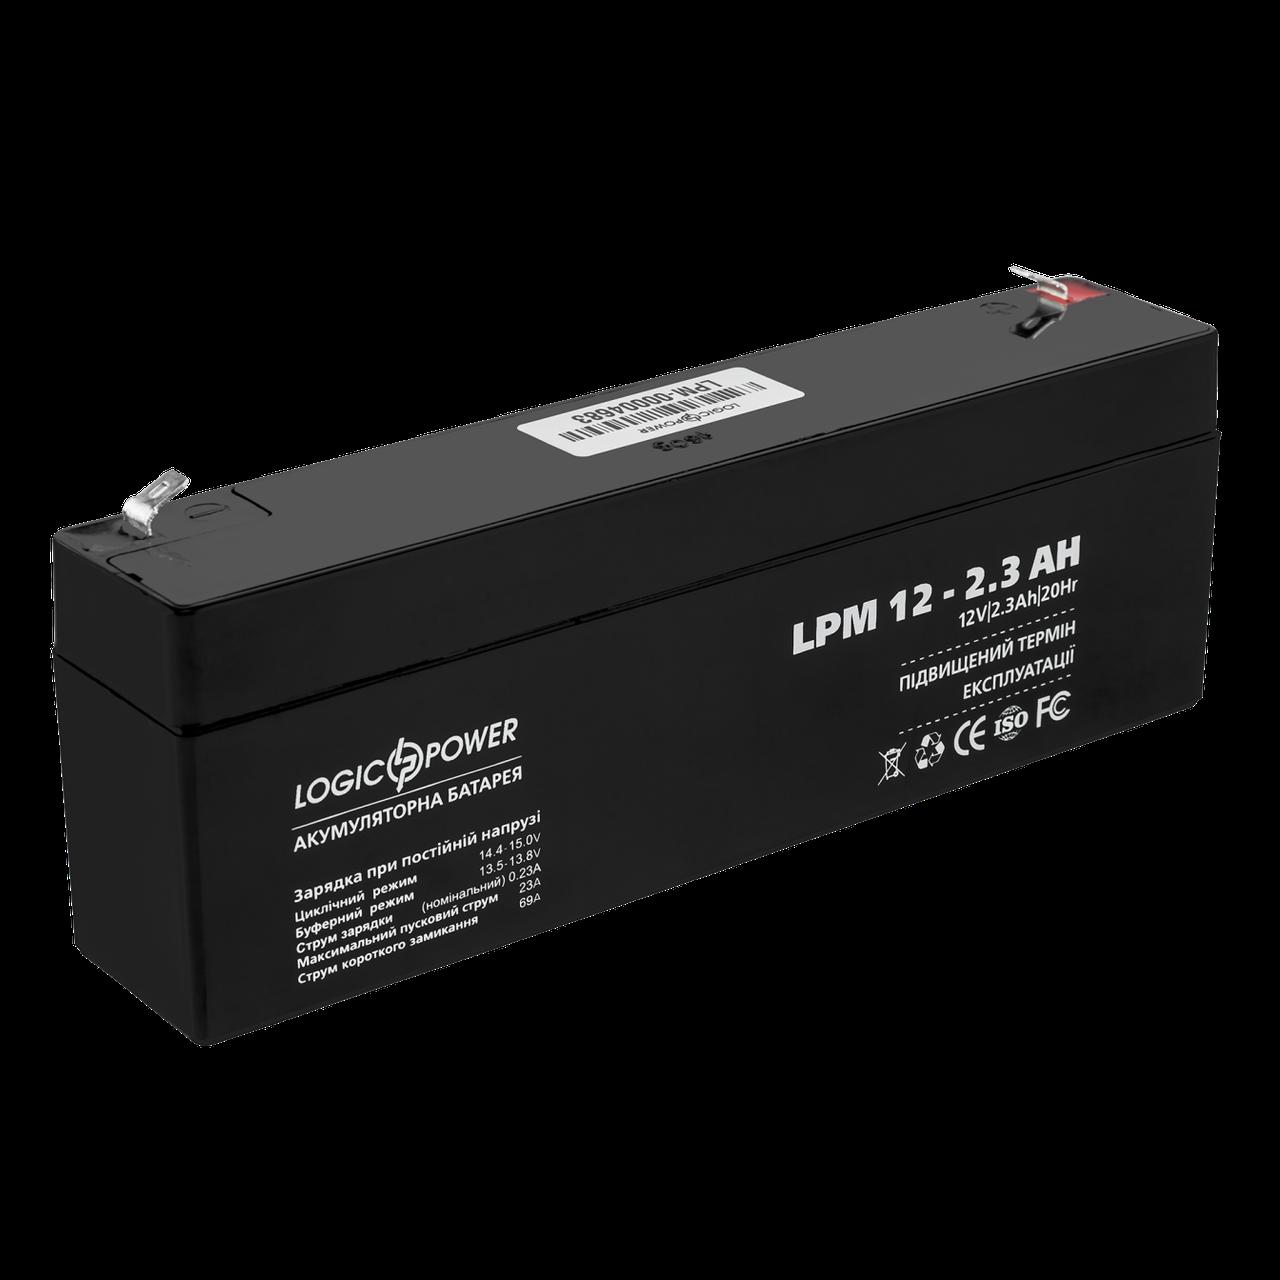 Аккумулятор кислотный AGM LogicPower LPM 12 - 2,3 AH